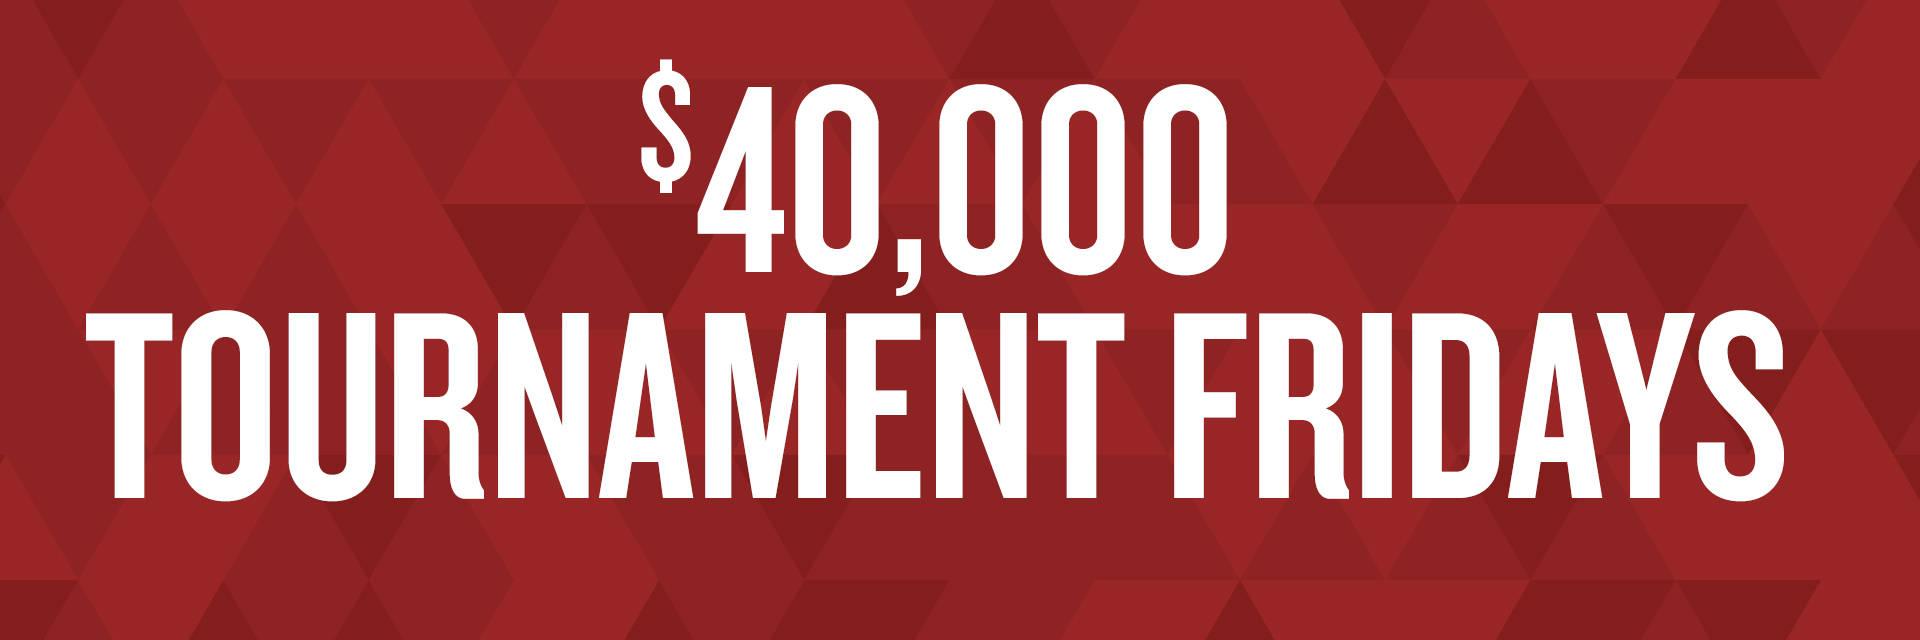 $40,000 TOURNAMENT FRIDAYS